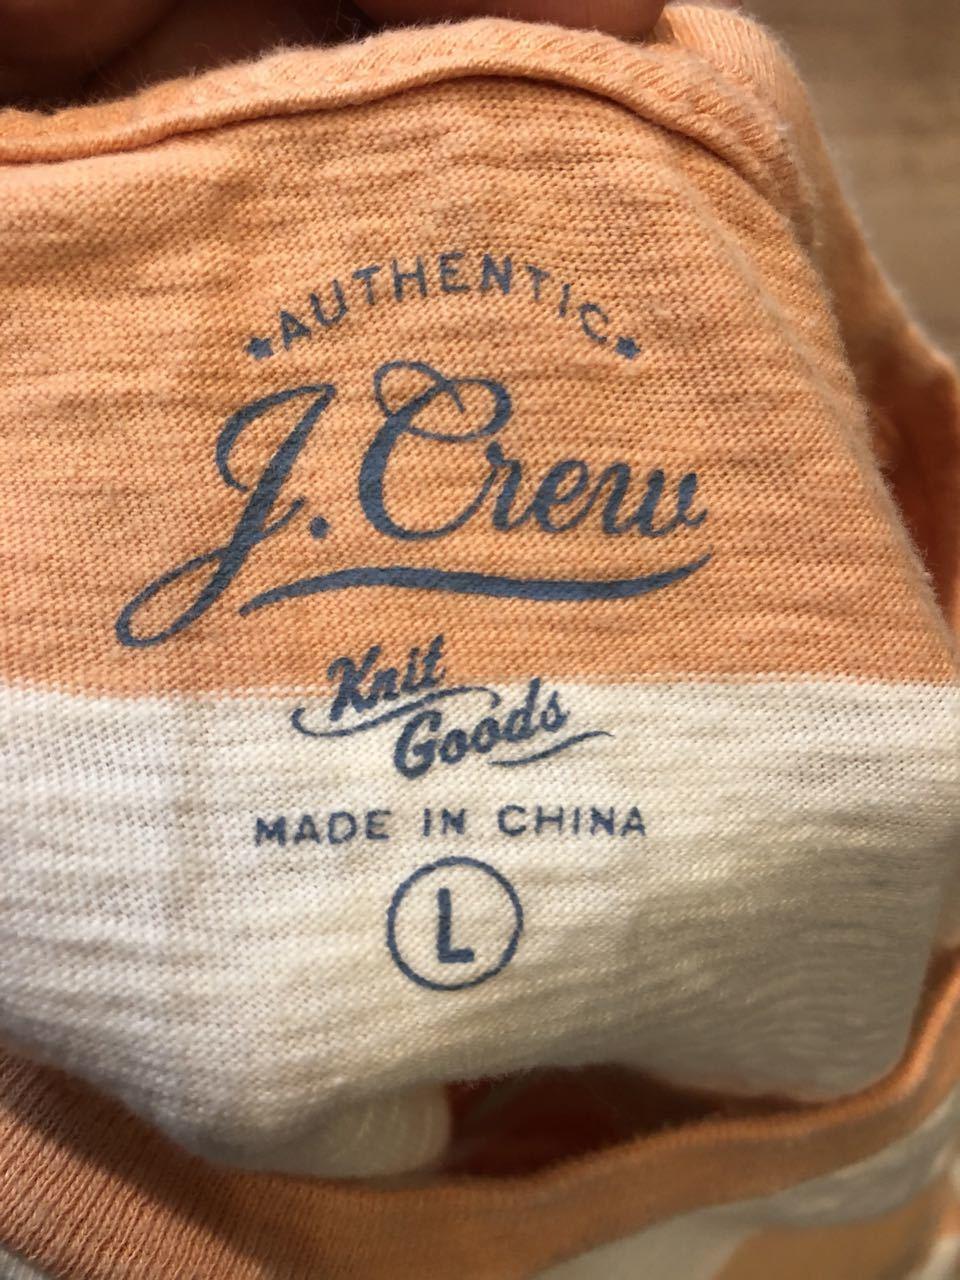 6月14日(日)入荷! J.CREW 太ボーダーTシャツ!_c0144020_13471735.jpg